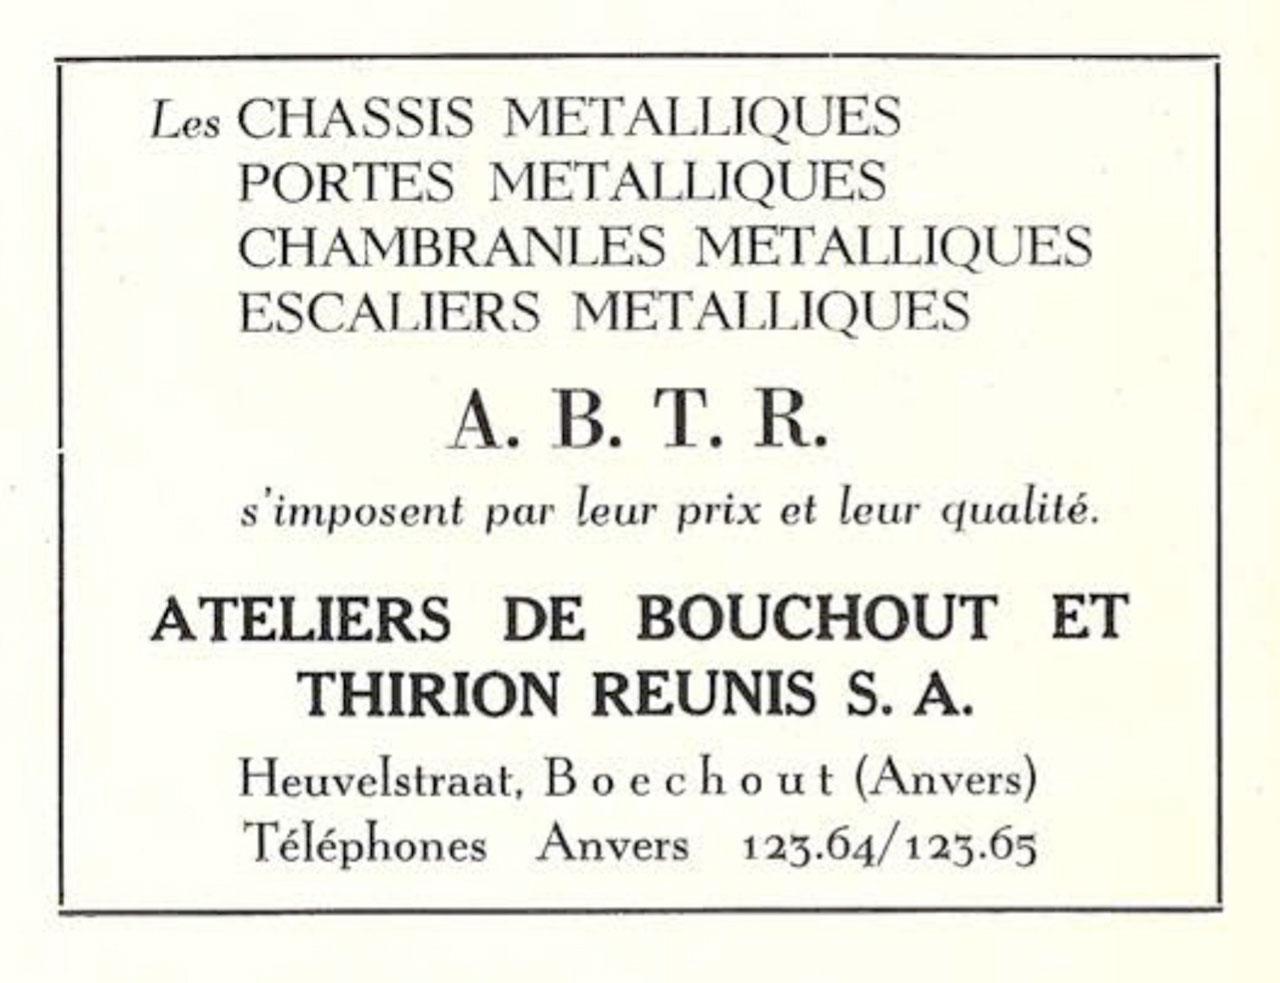 Châssis Métalliques A.B.T.R.